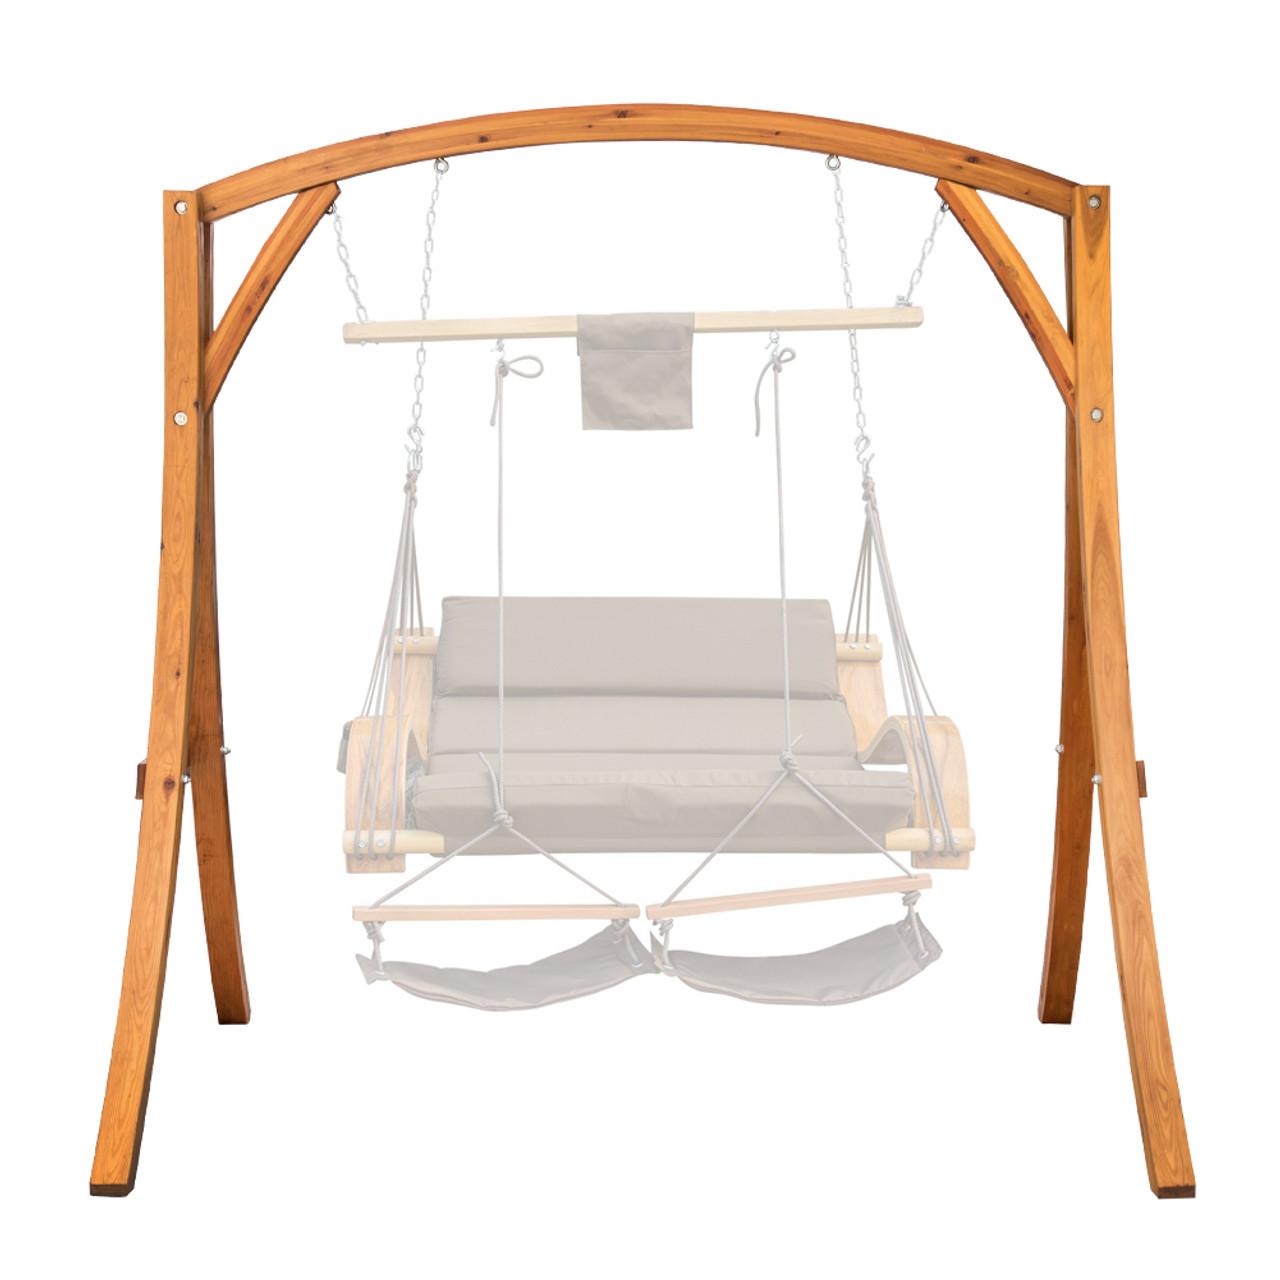 Lazy Daze Hammocks Deluxe Wooden Arc Frame Hammock Swing Chair Stand